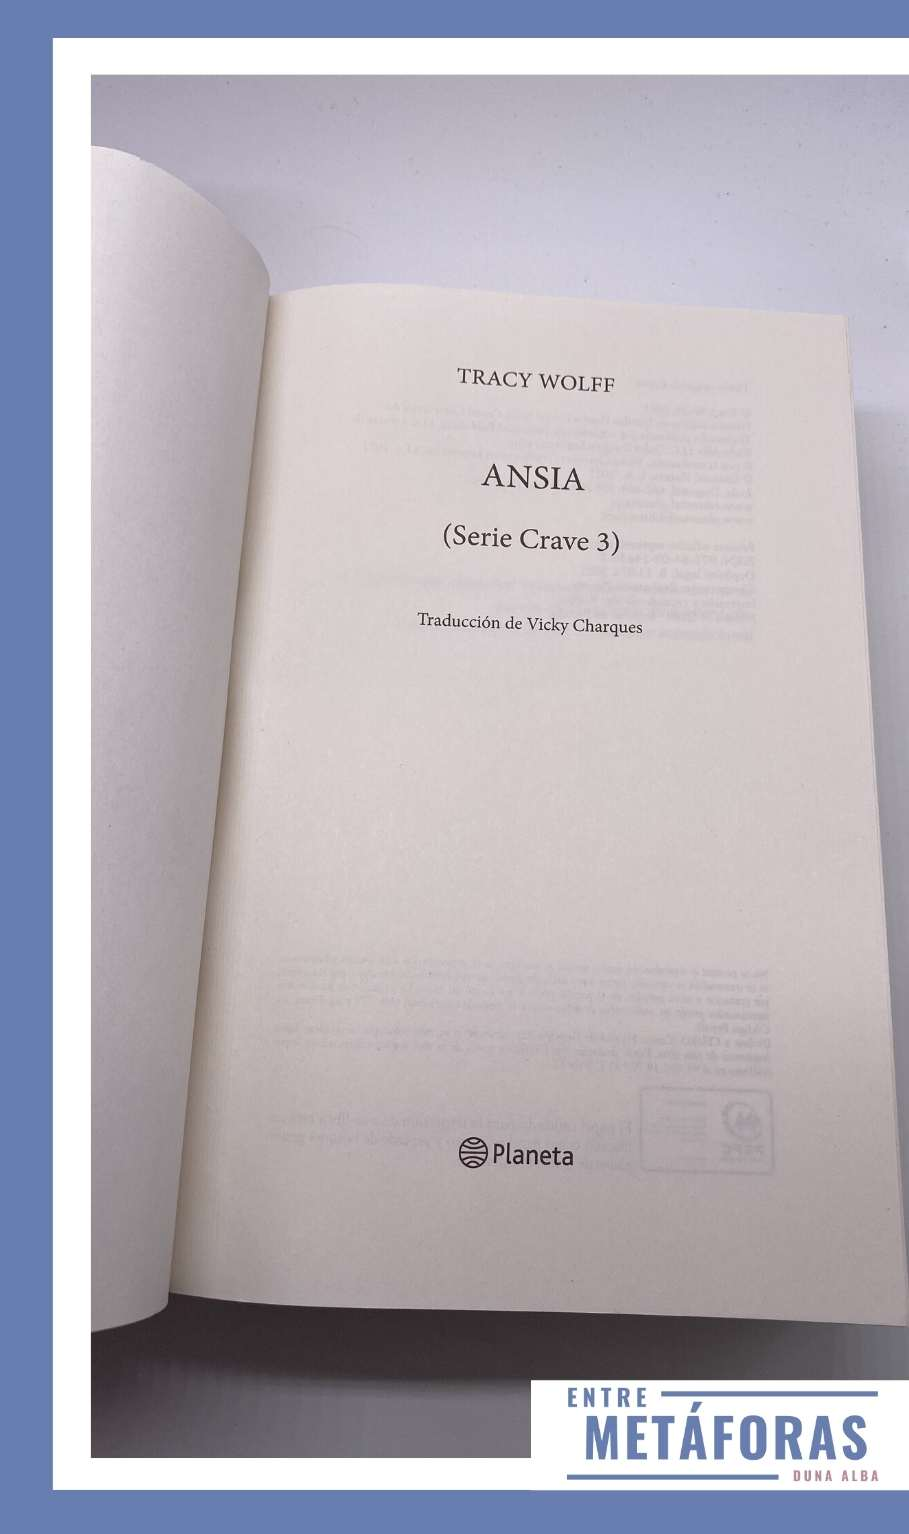 Ansia (Crave #3), de Tracy Wolff